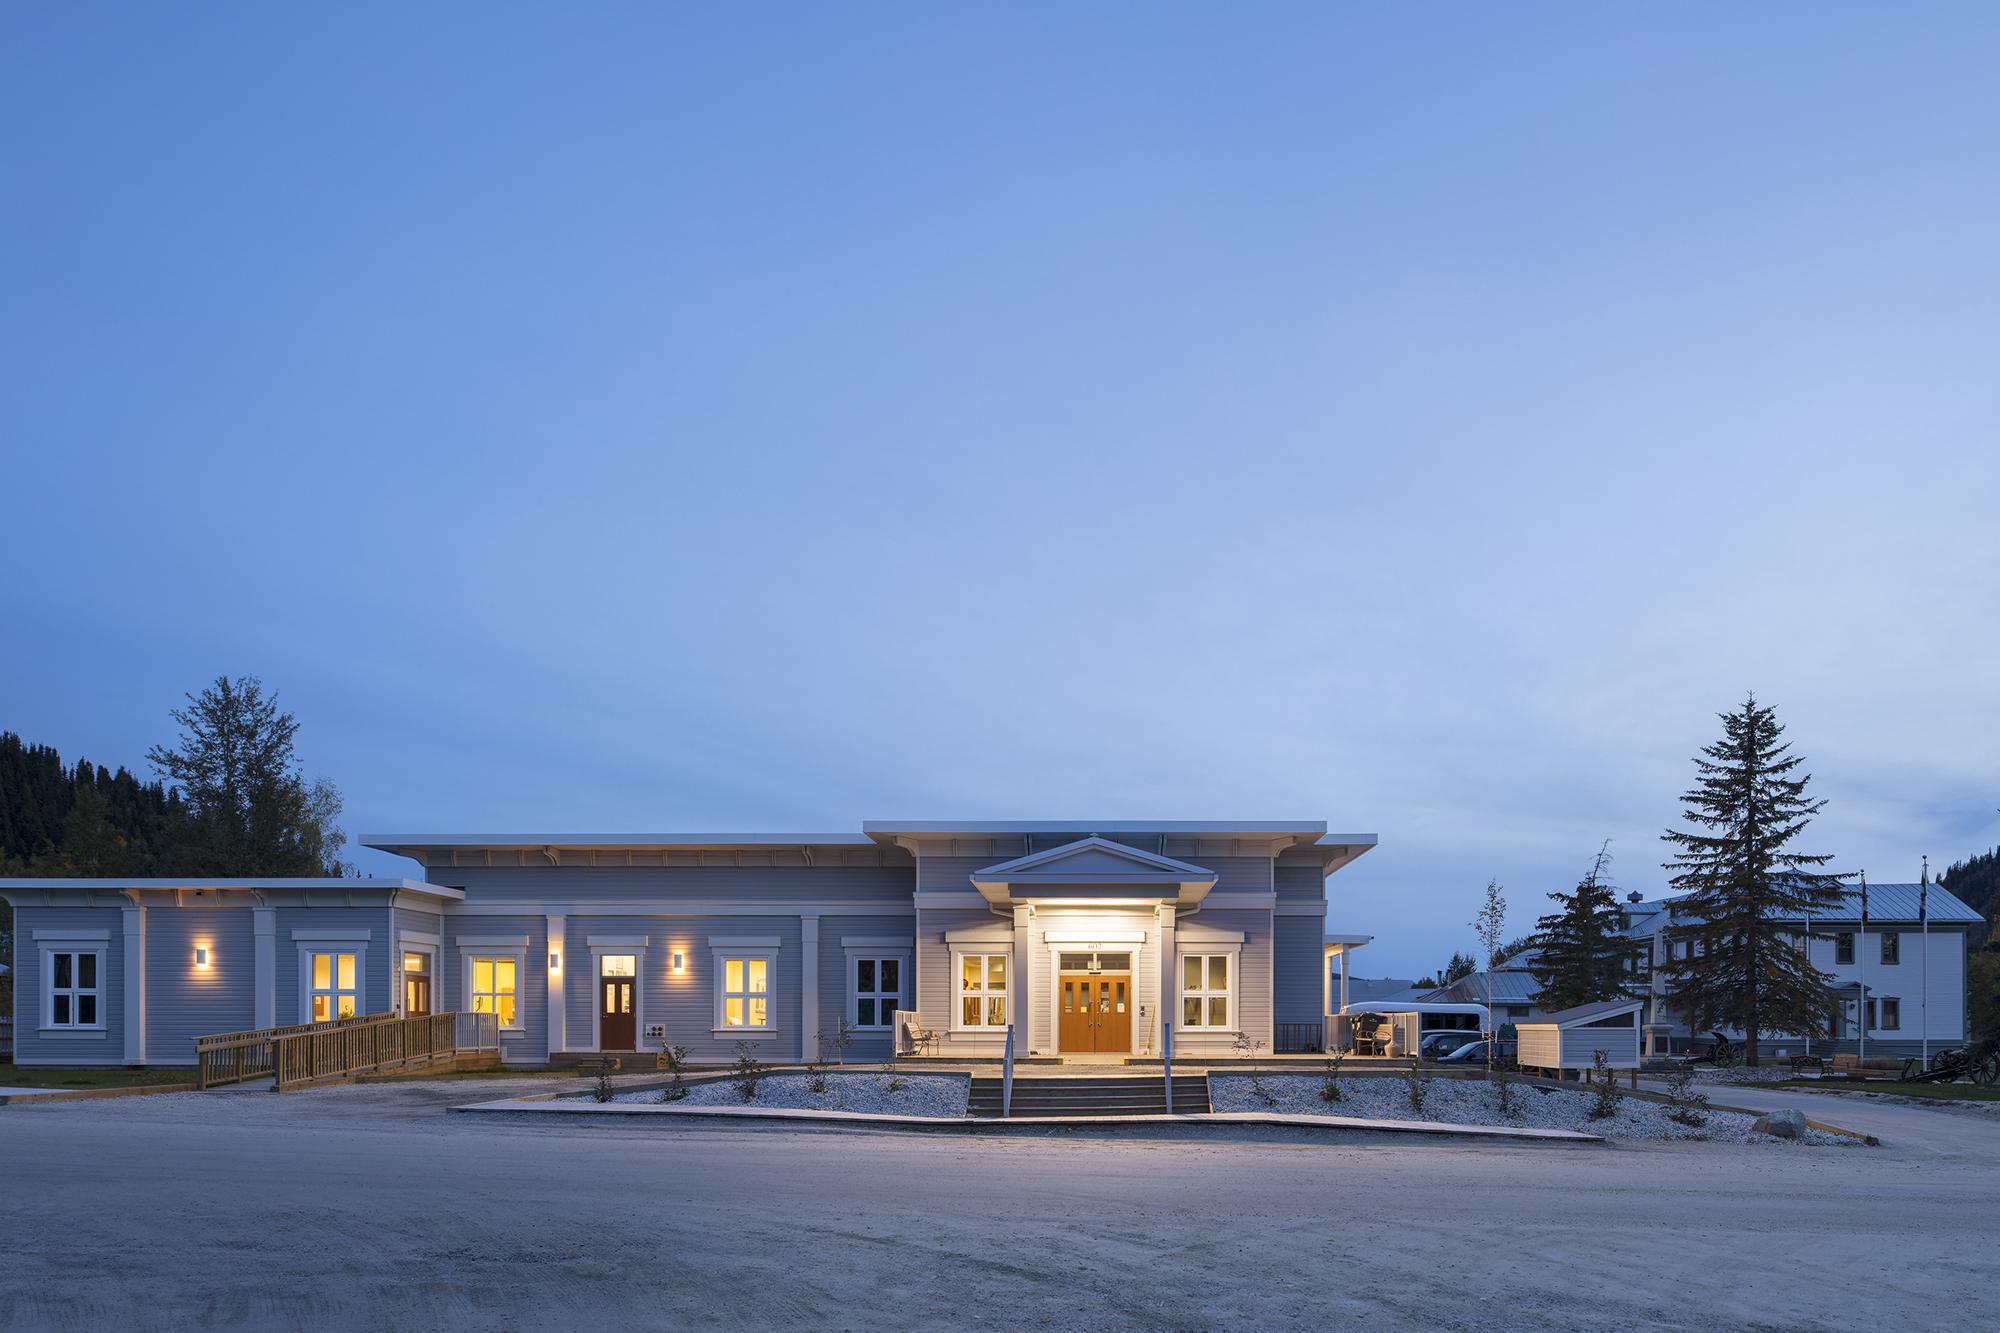 Dawson City Alexander McDonald Lodge